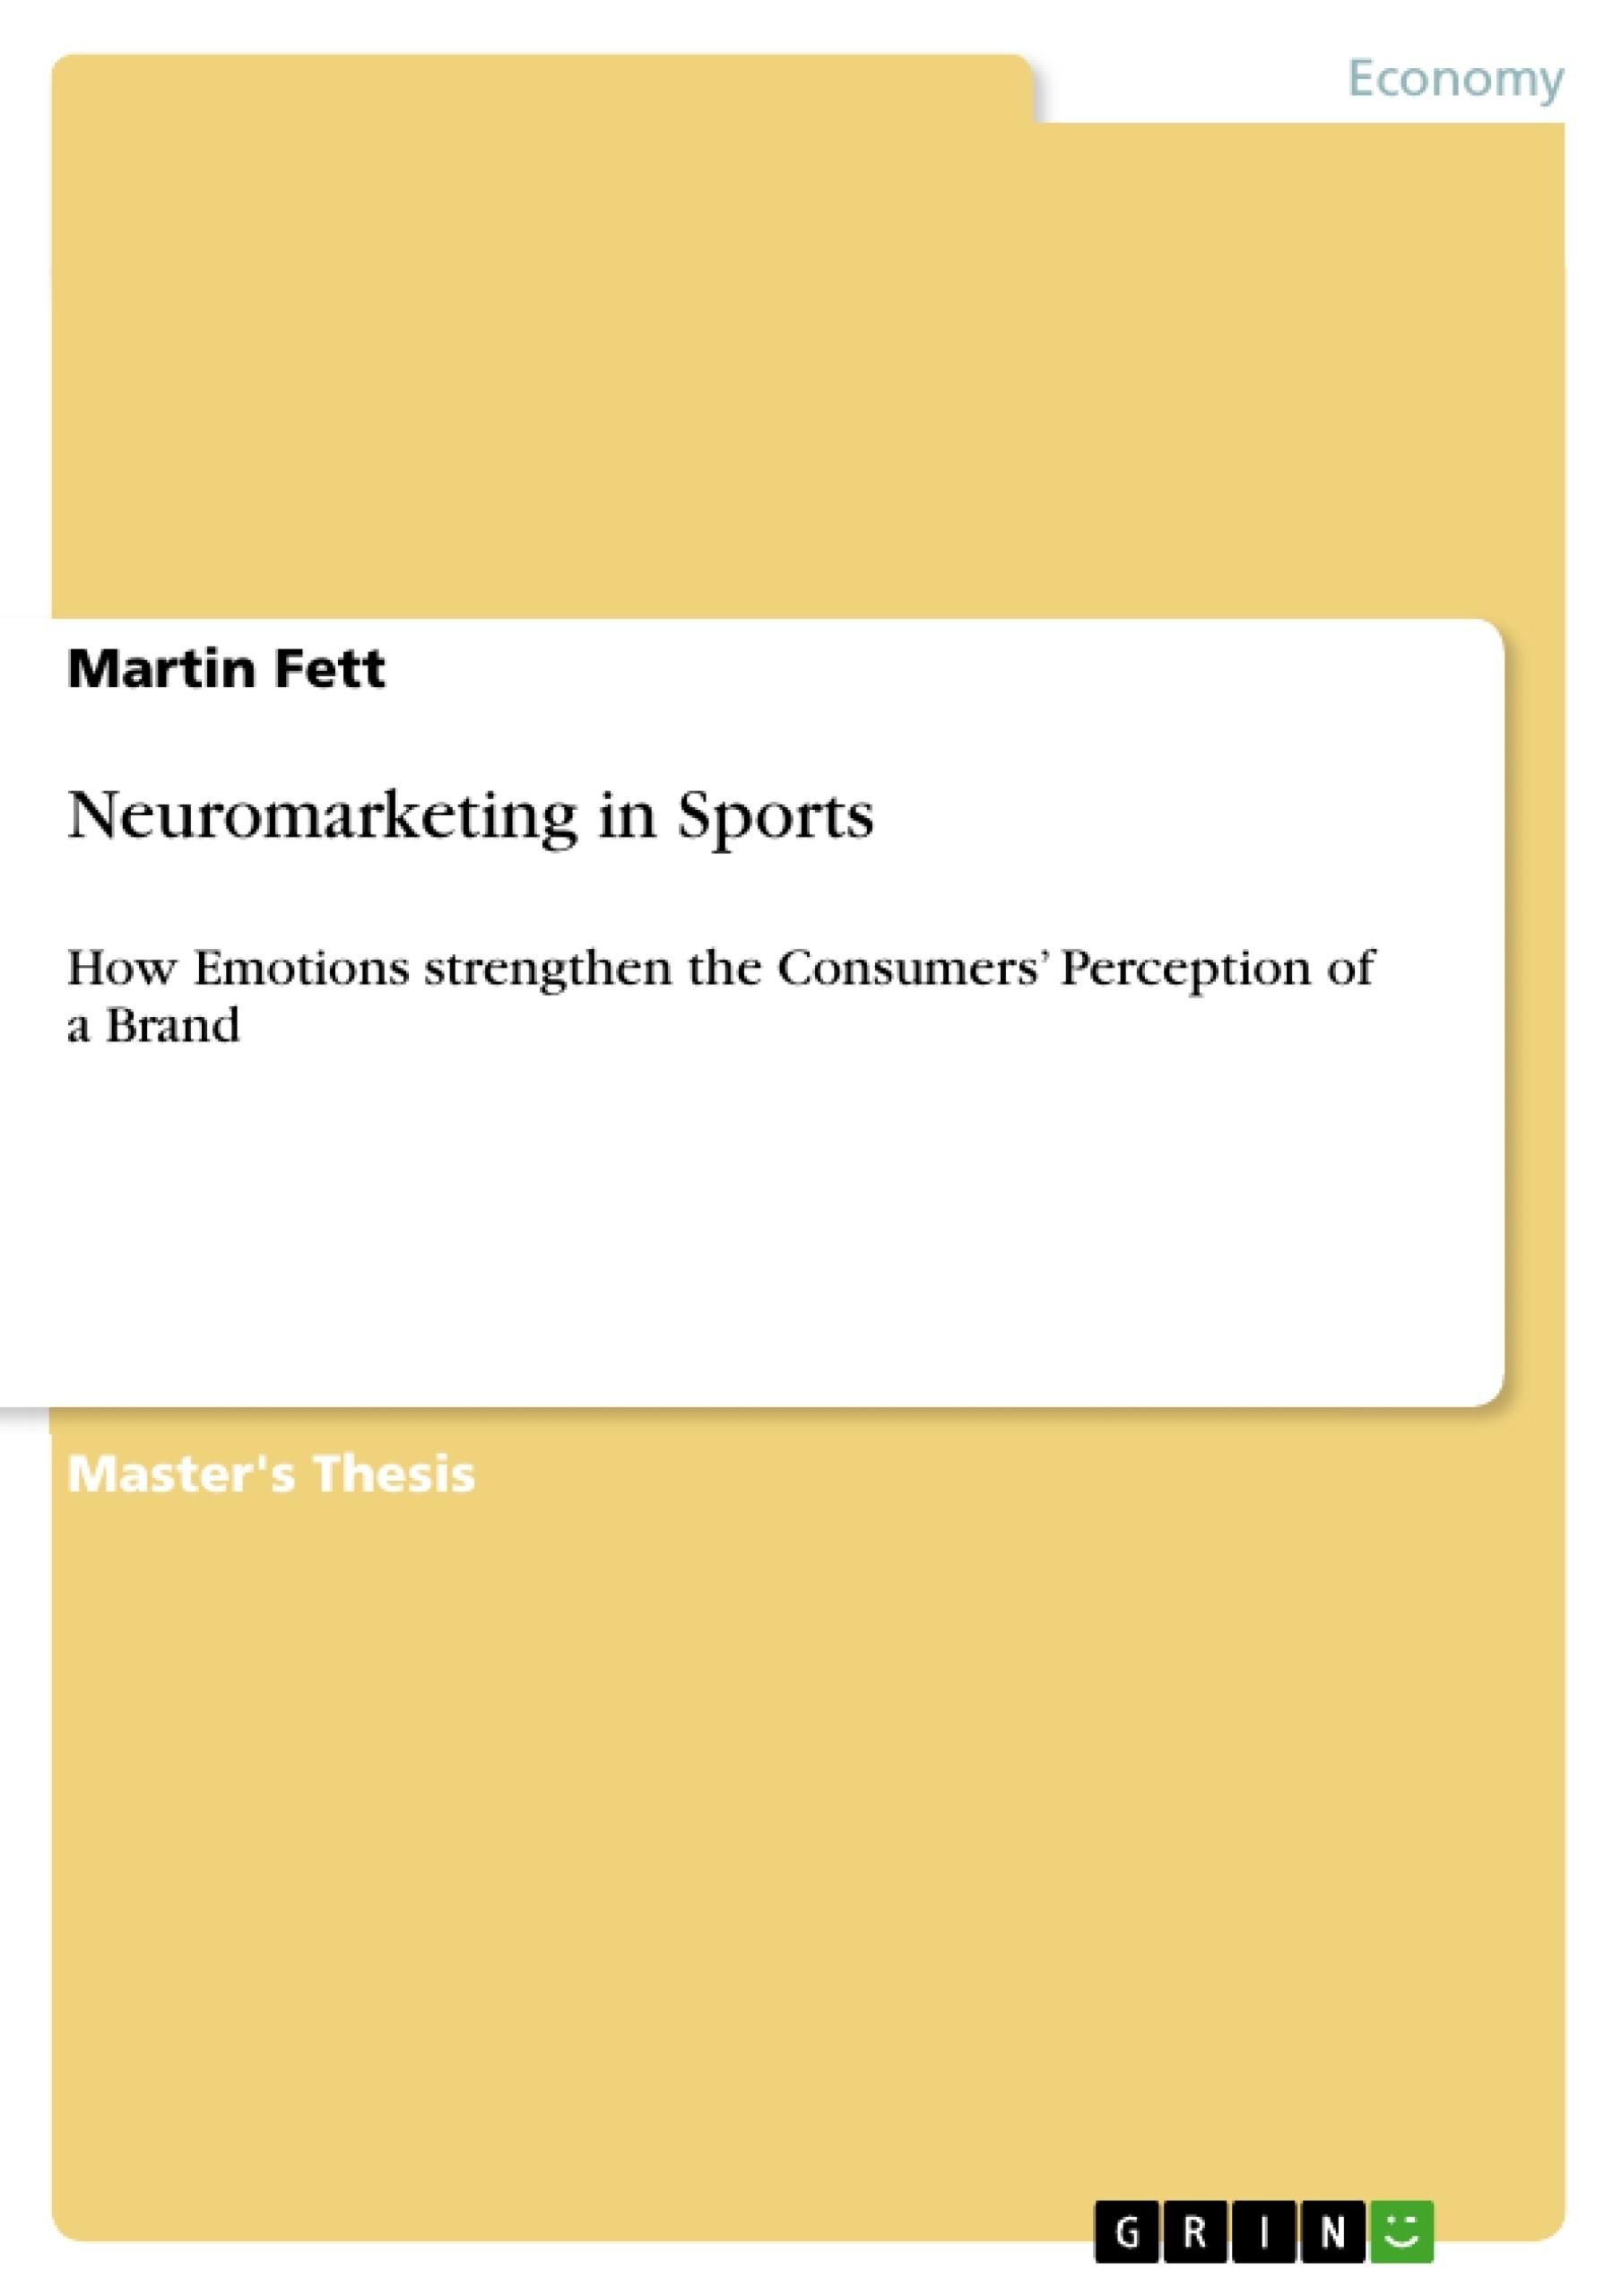 neuromarketing dissertation topics